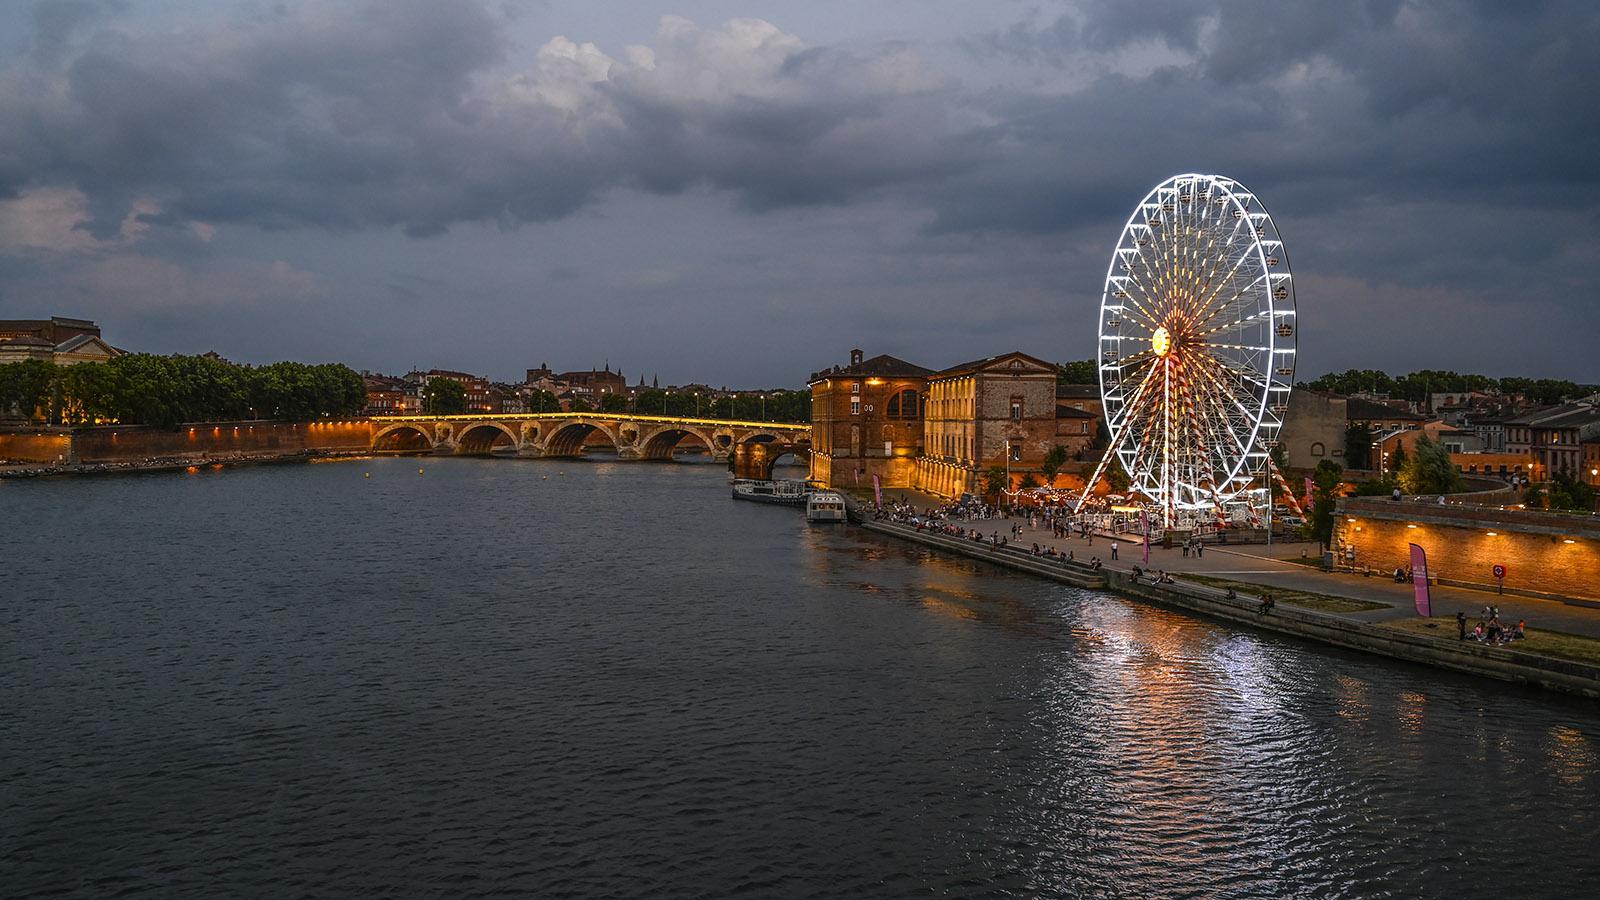 Toulouse: Blick auf Port Viguerie mit dem Riesenrad - dort steht es im Sommer bei Toulouse Plages. Foto: Hilke Maunder